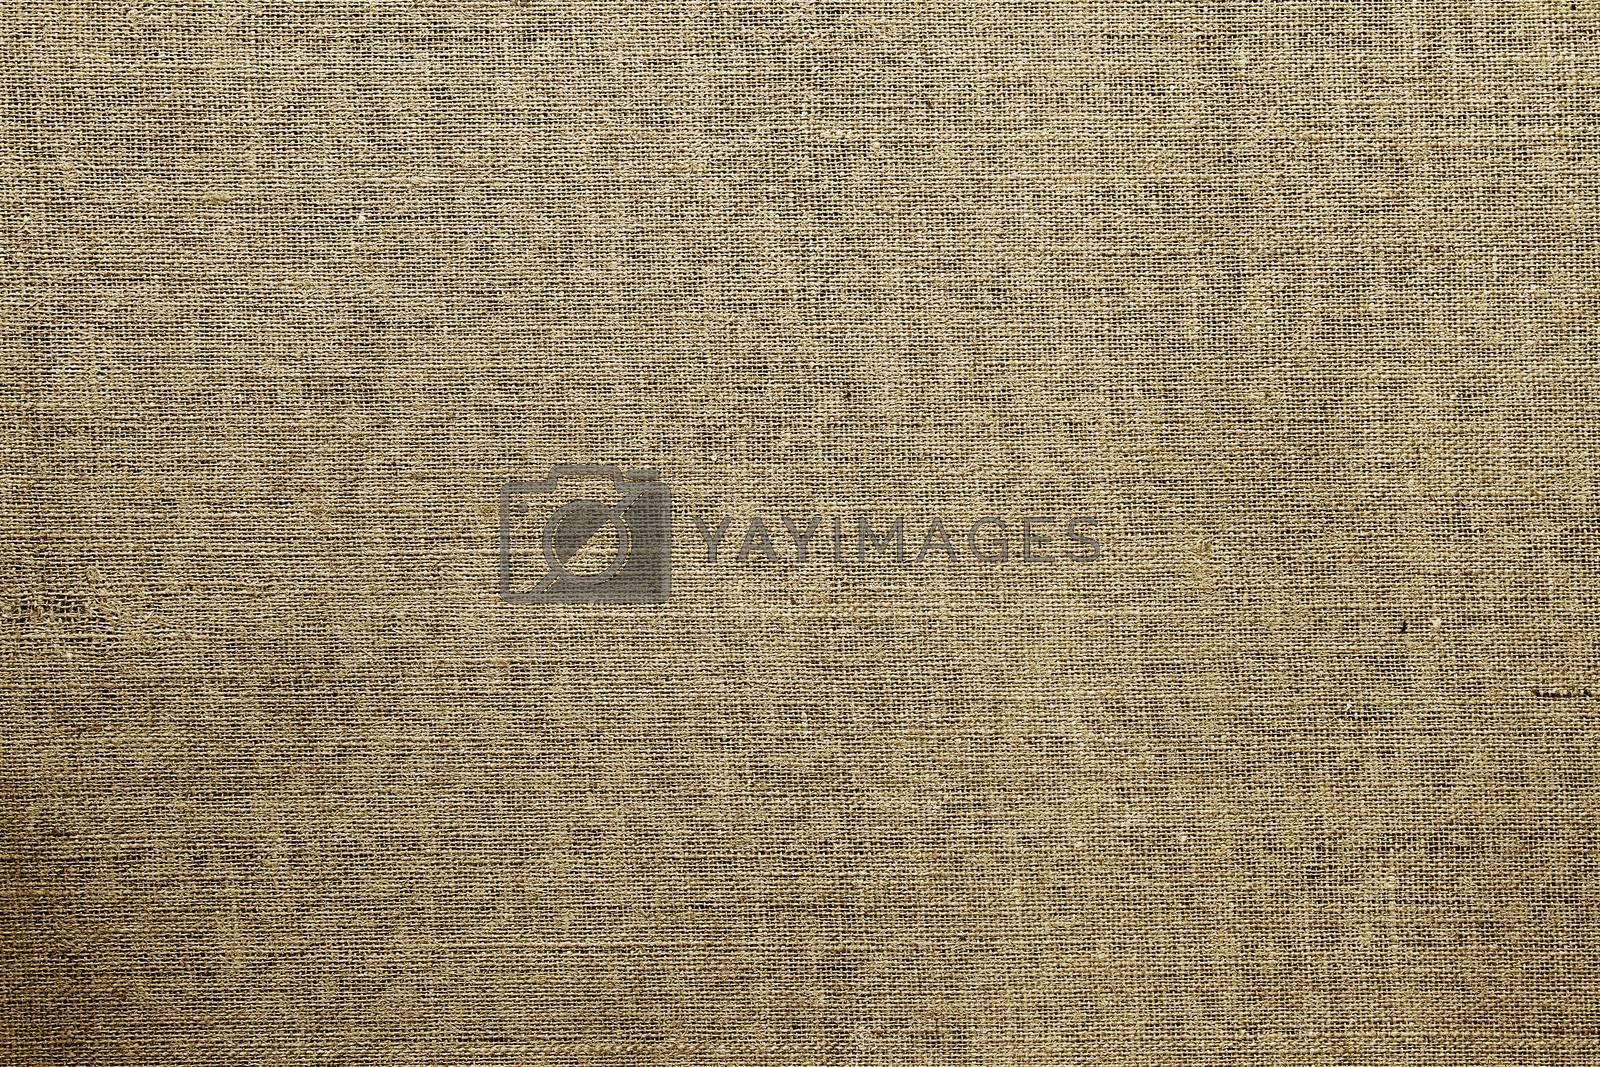 Closeup of brown textured surface